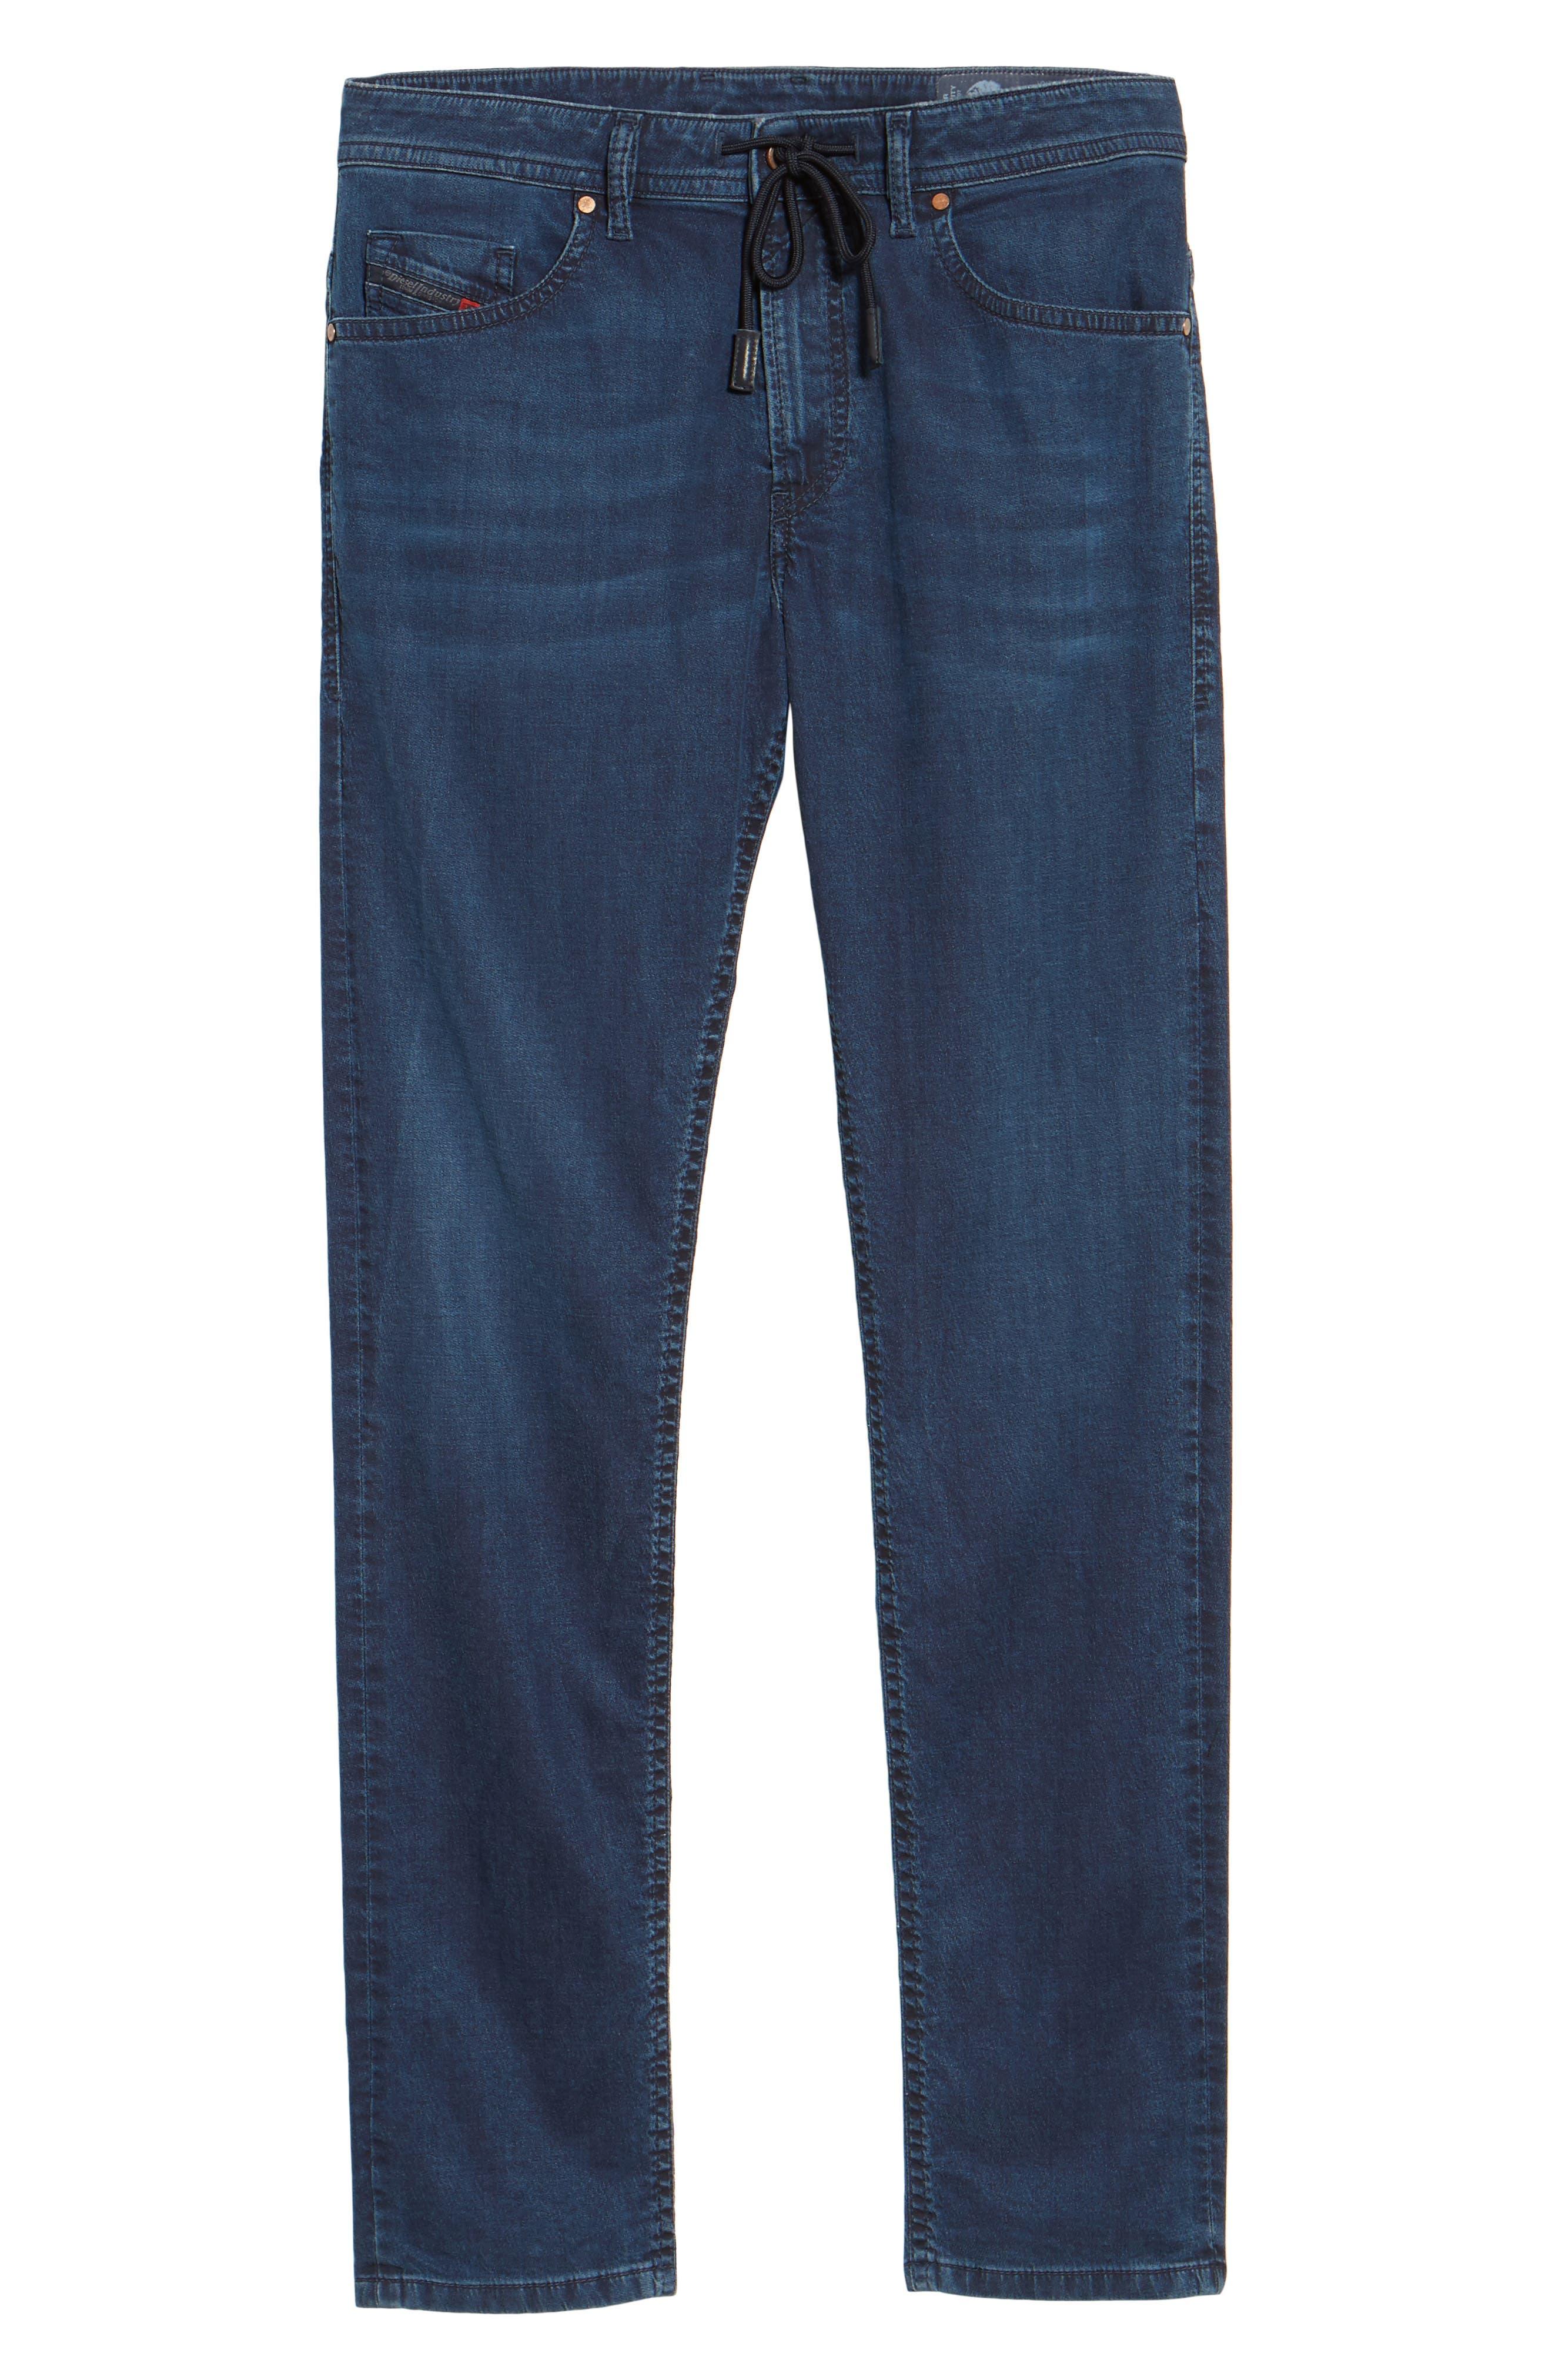 Thommer Slim Fit Jeans,                             Alternate thumbnail 6, color,                             0688J